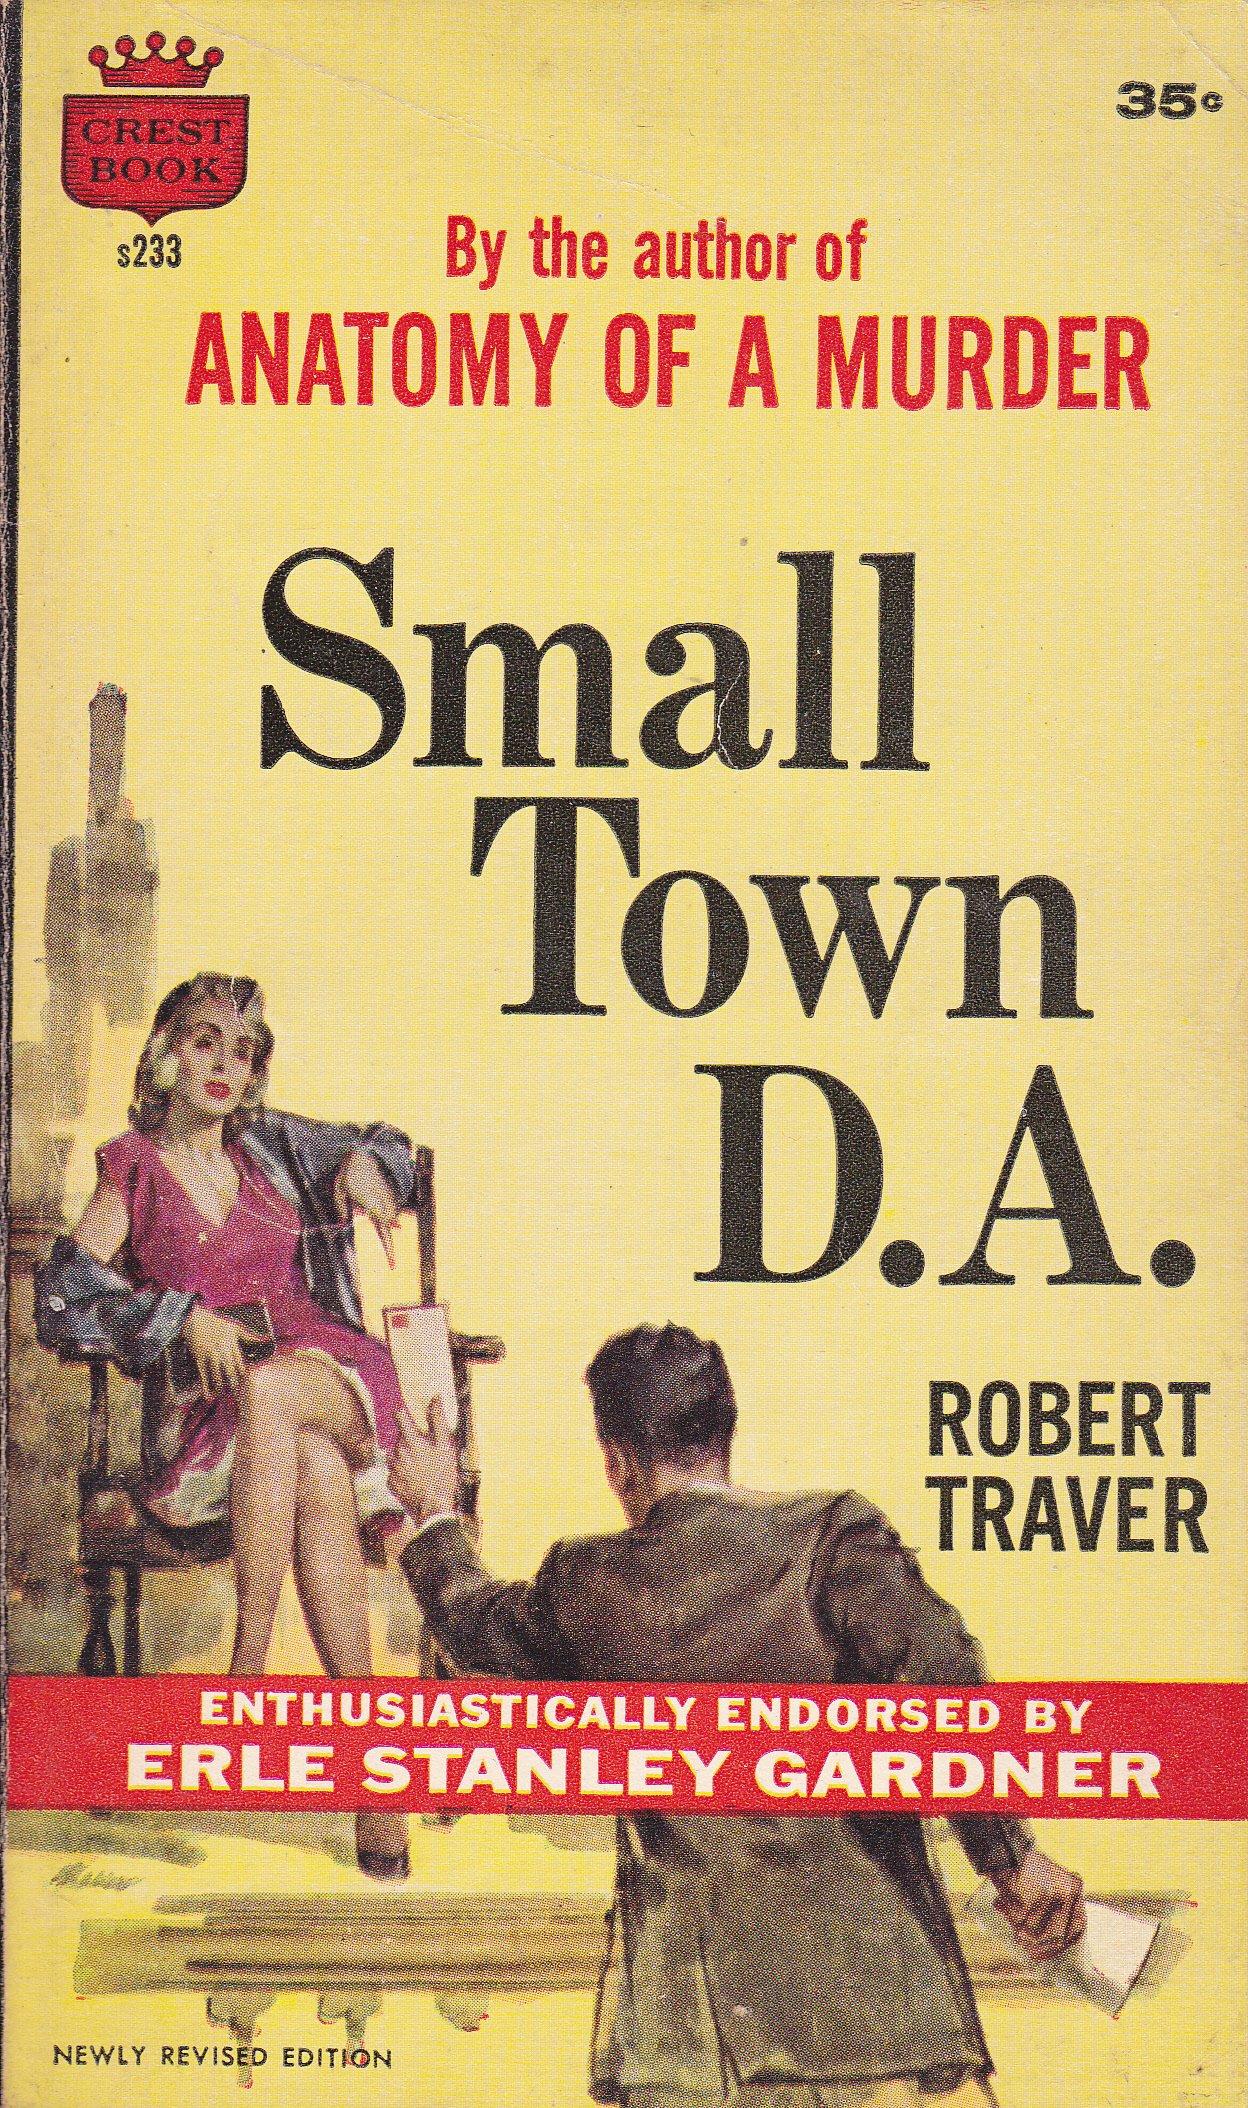 Small Town D.A.: Robert Traver: Amazon.com: Books